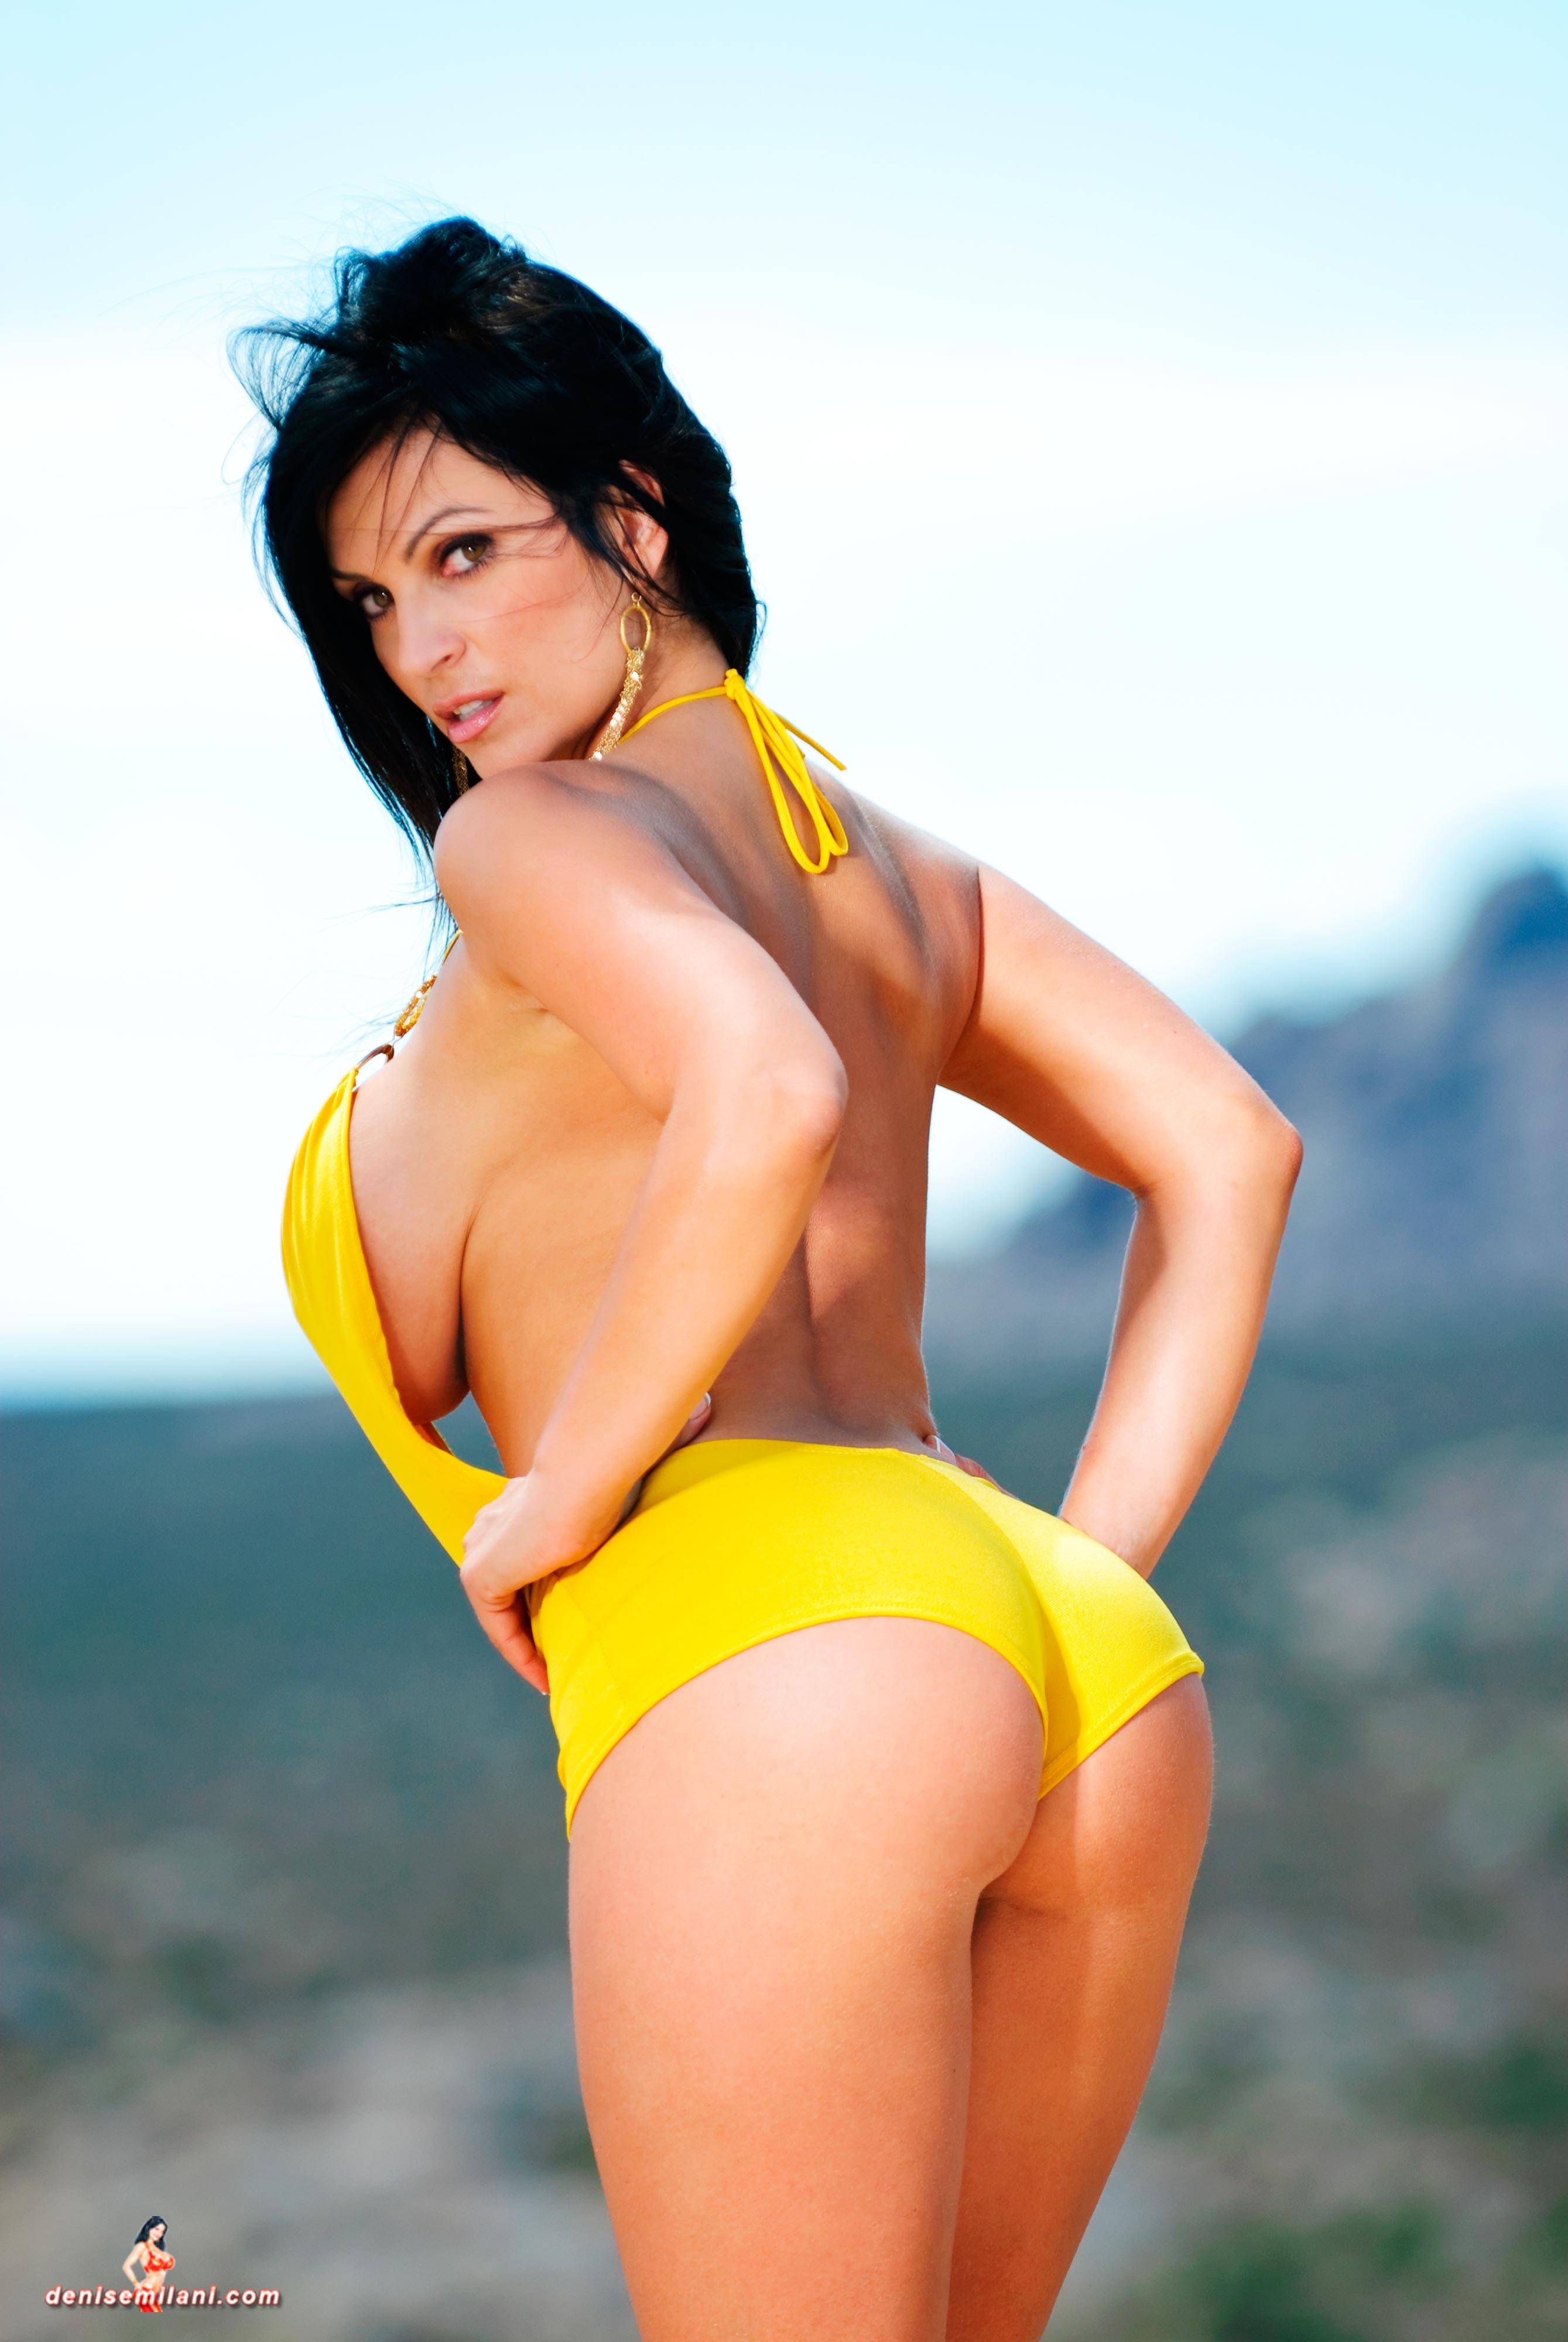 Denise firm ass | Hot images)